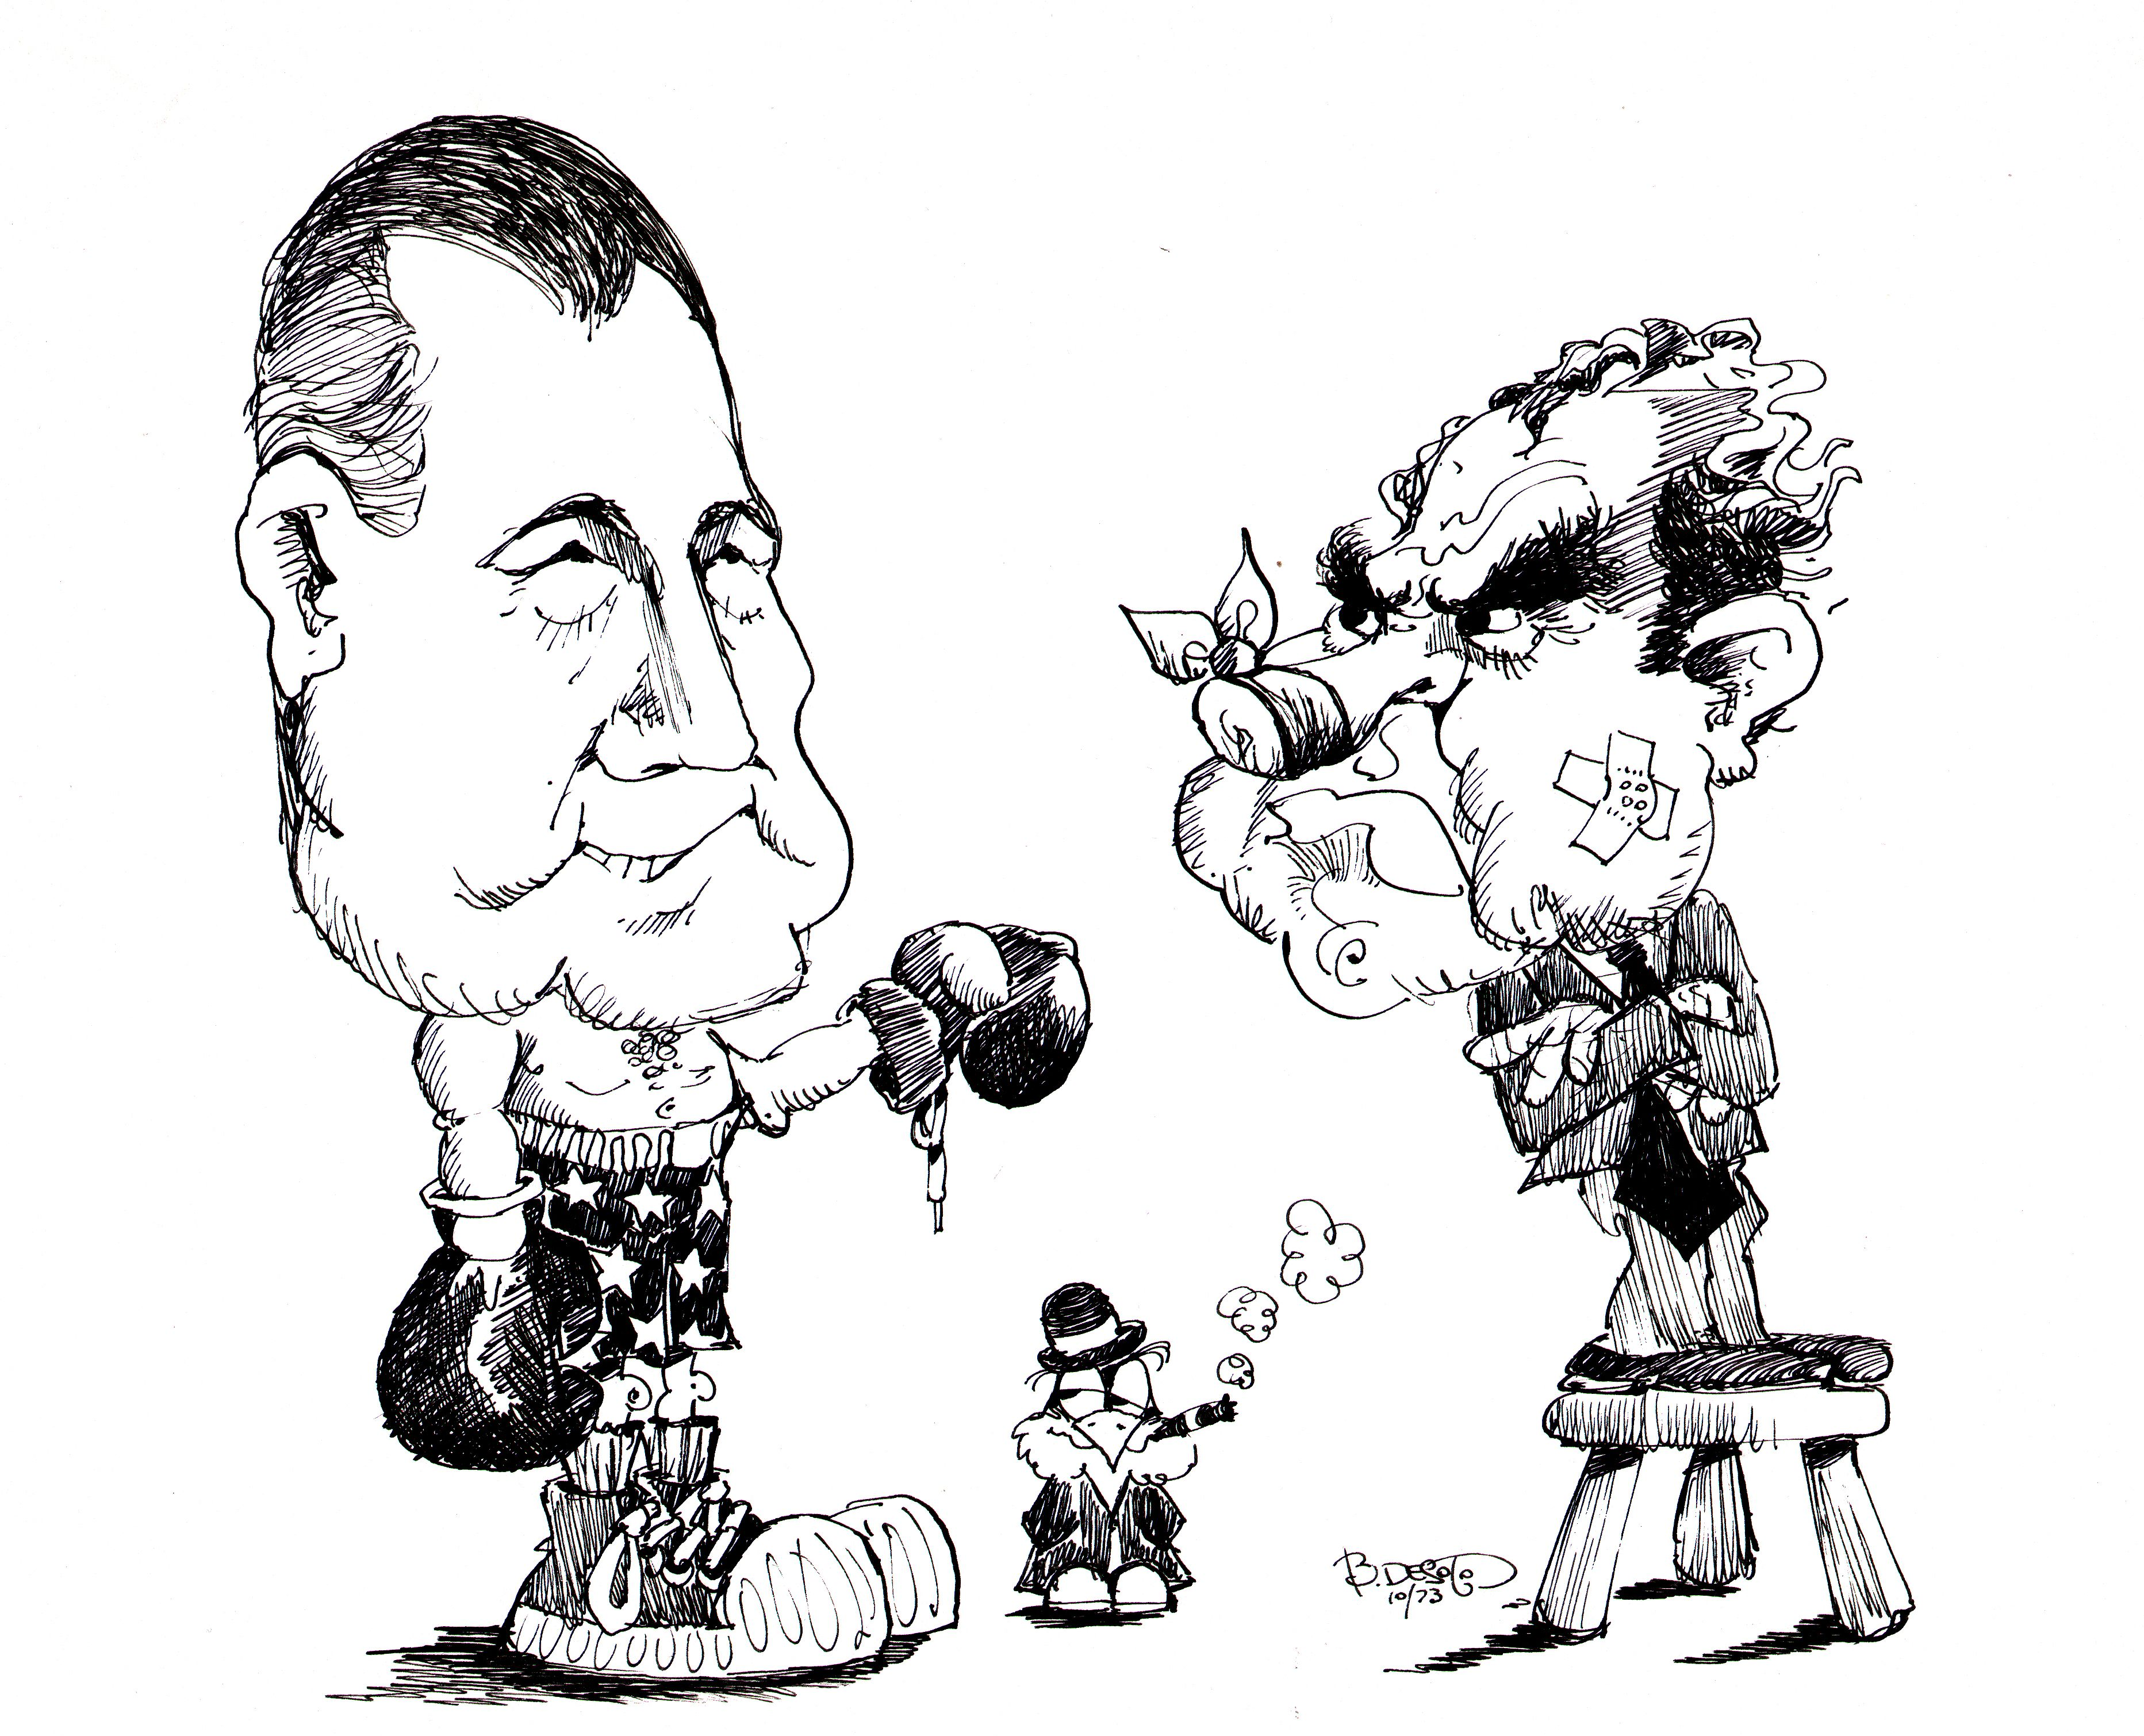 Spiro Agnew and Richard Nixon political cartoon from 1973